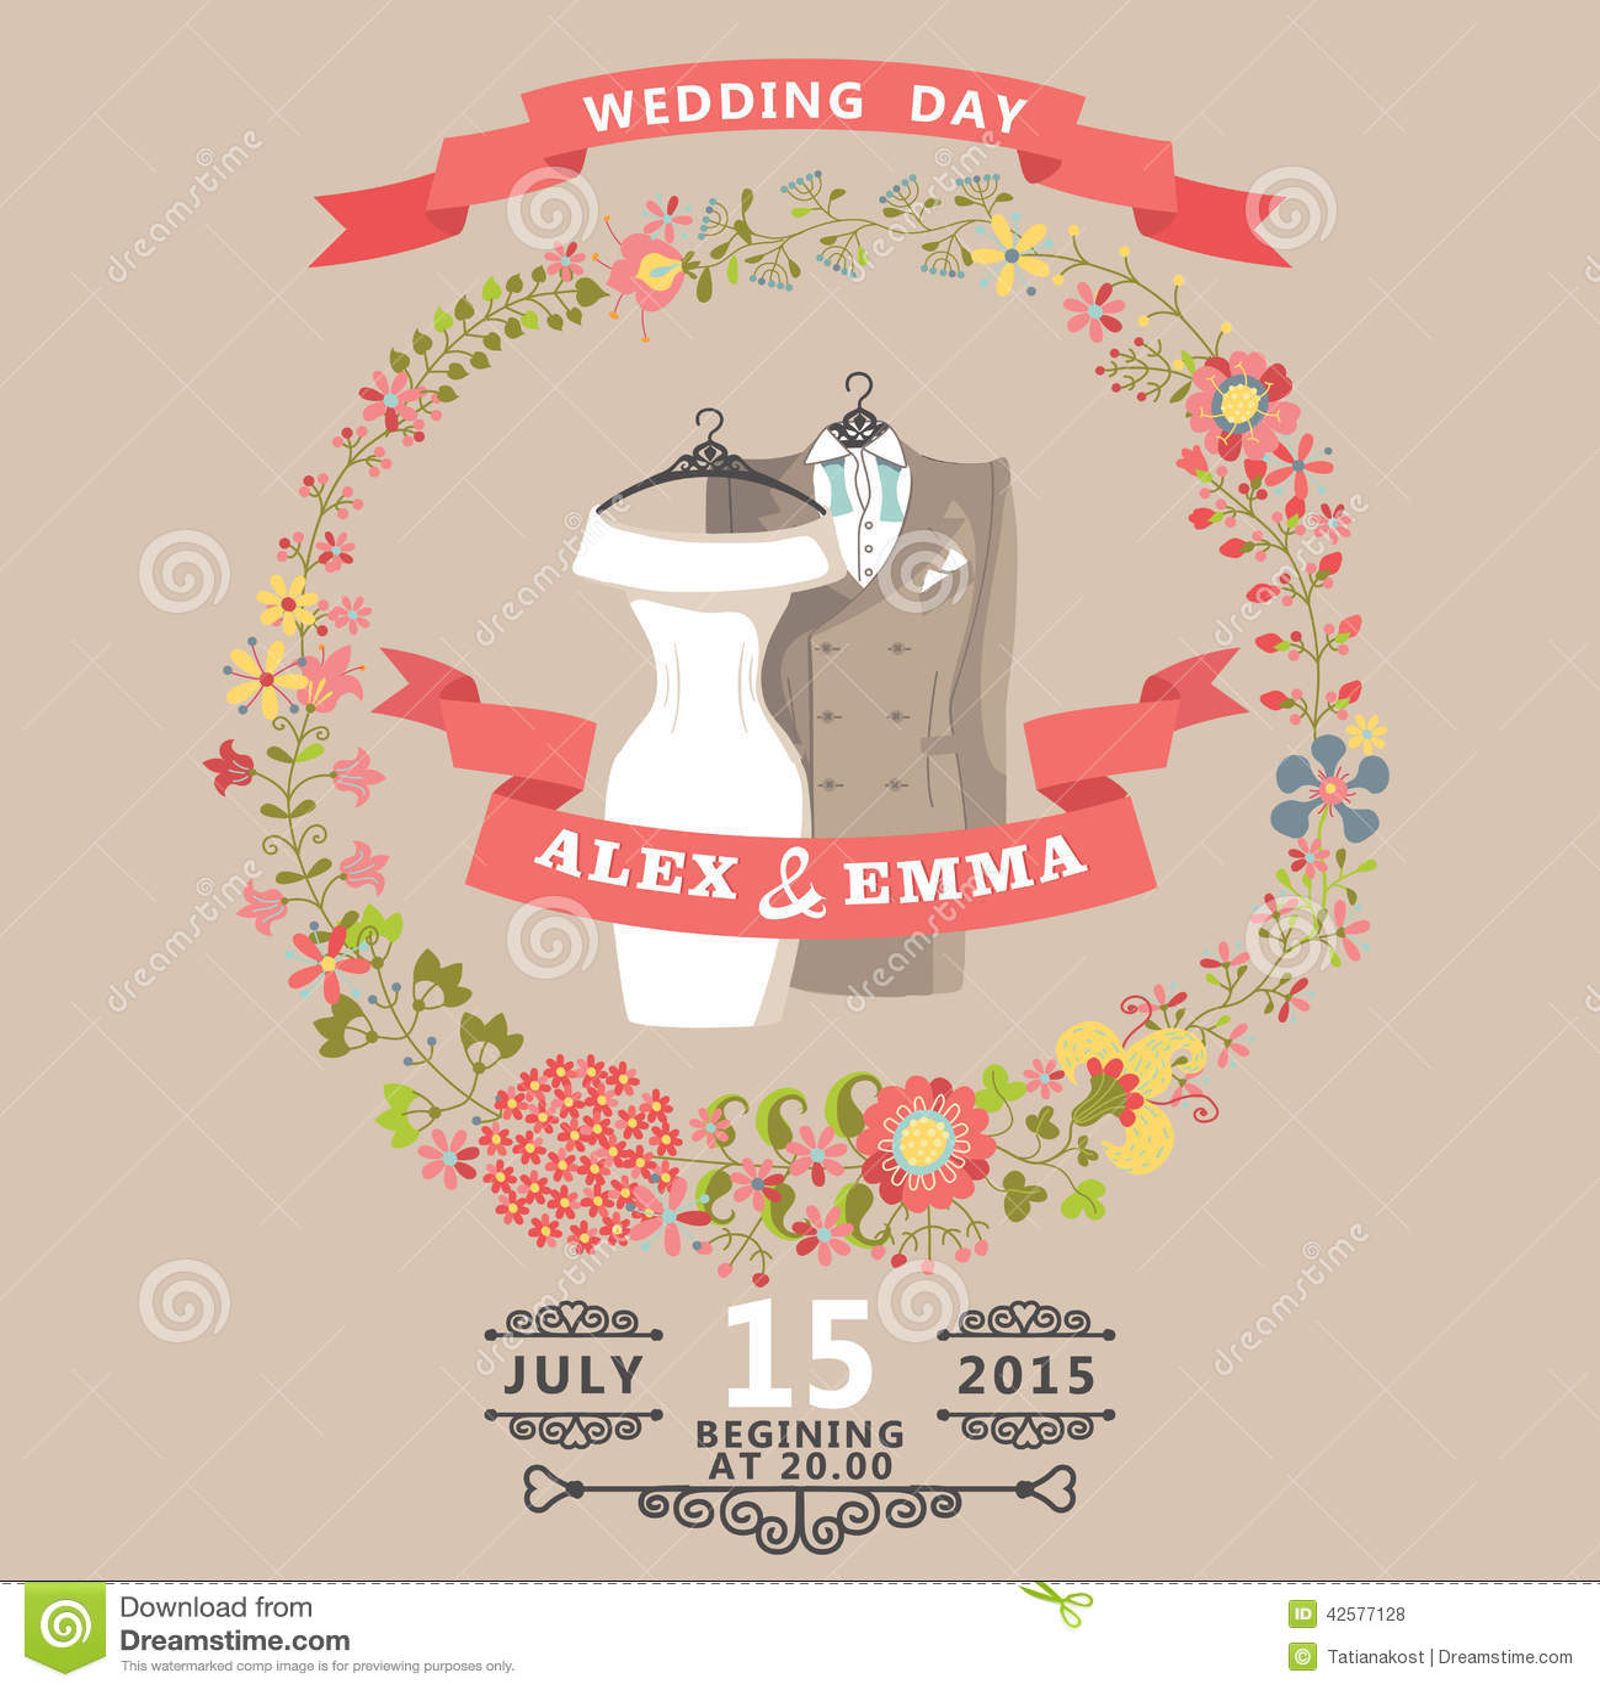 Cute Wedding Invitation With Wedding Wear And Floral